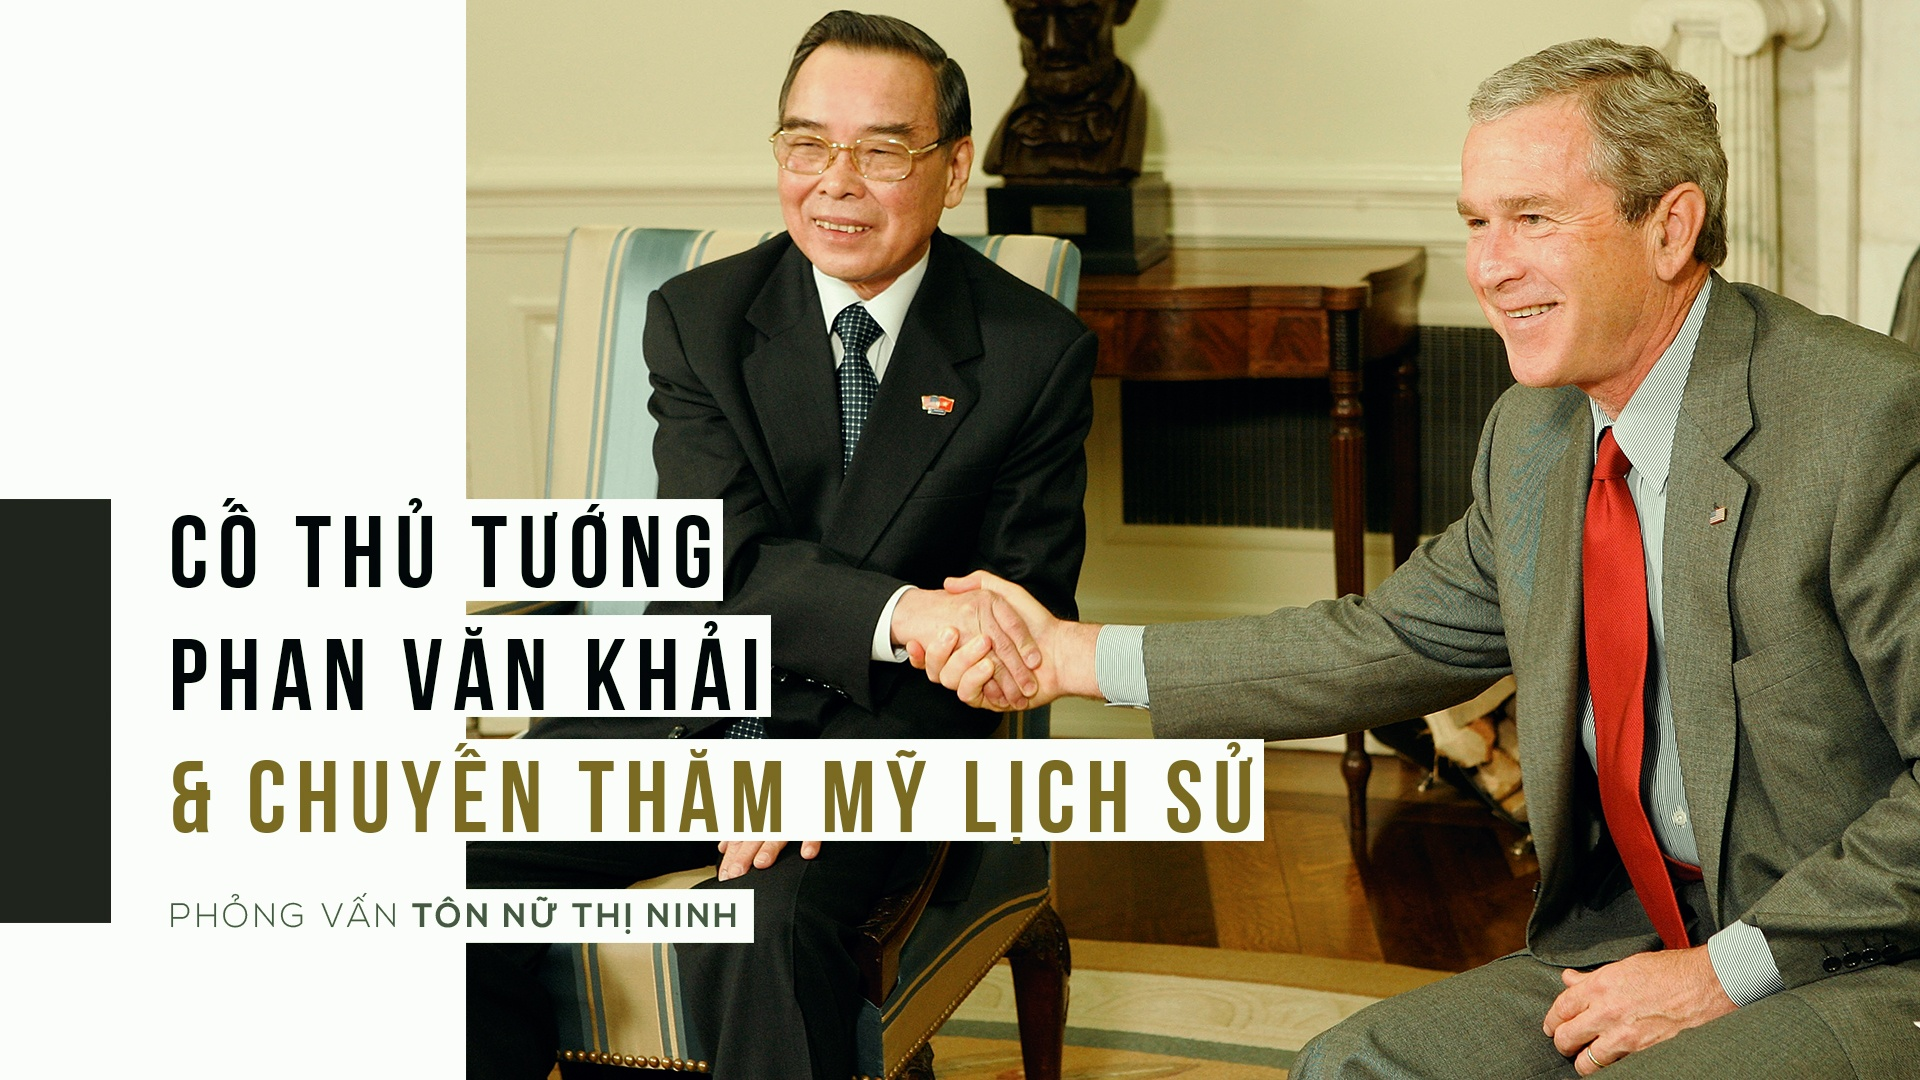 Tu chuyen di lich su cua TTg Phan Van Khai, nhin lai quan he Viet - My hinh anh 1